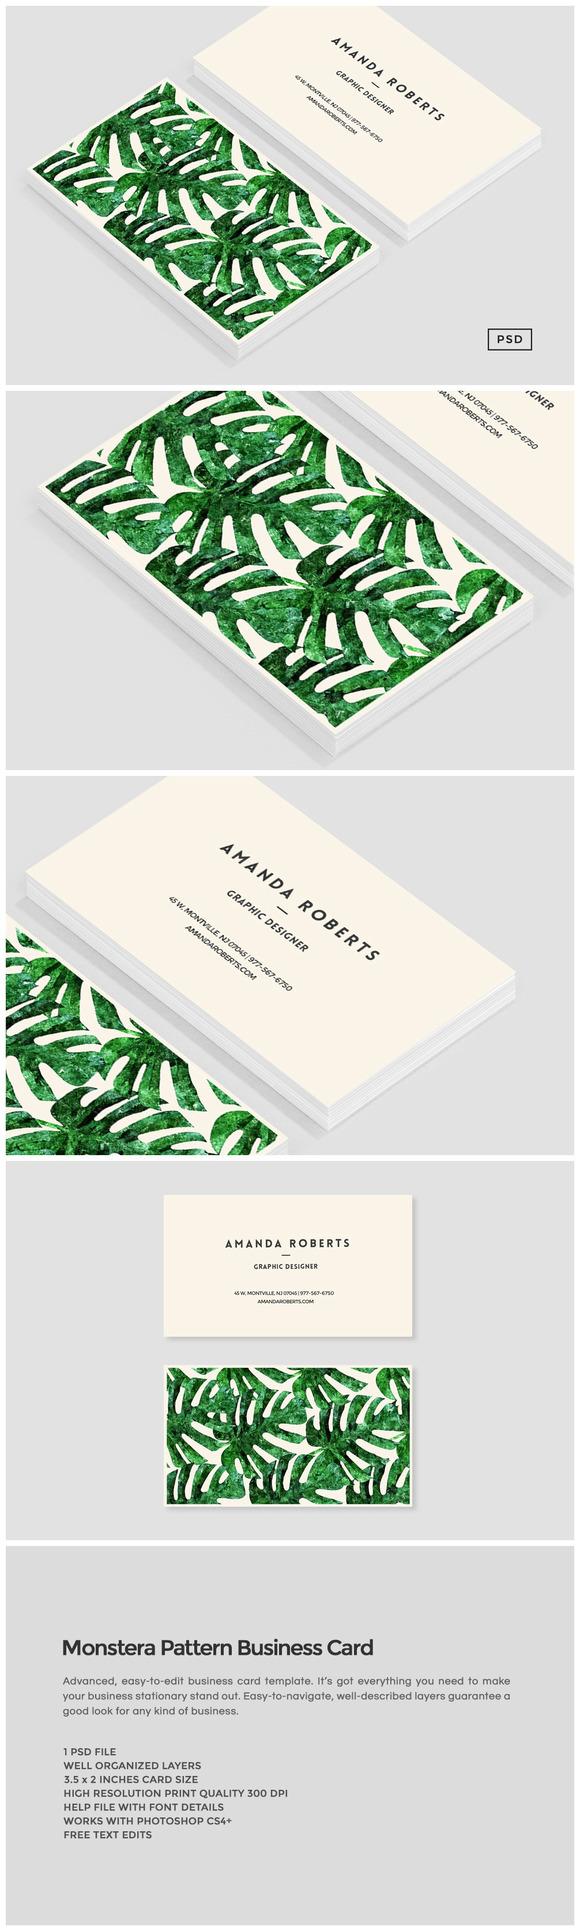 Monstera Pattern Business Card